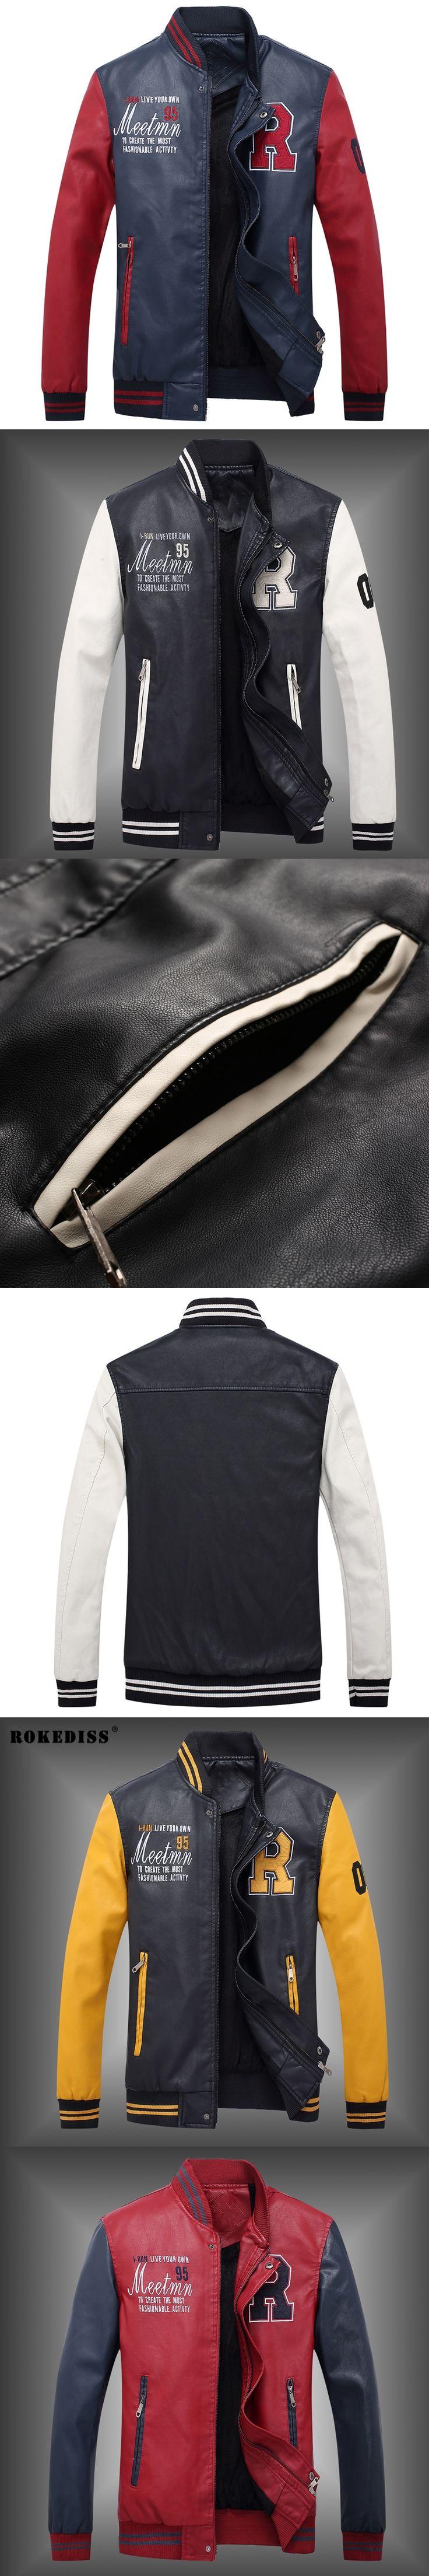 ROKEDISS 2017 New Men's Winter PU Jackets Coat Male Brand fashion personality Leisure Men PU Jackets Coat M-2XL W004